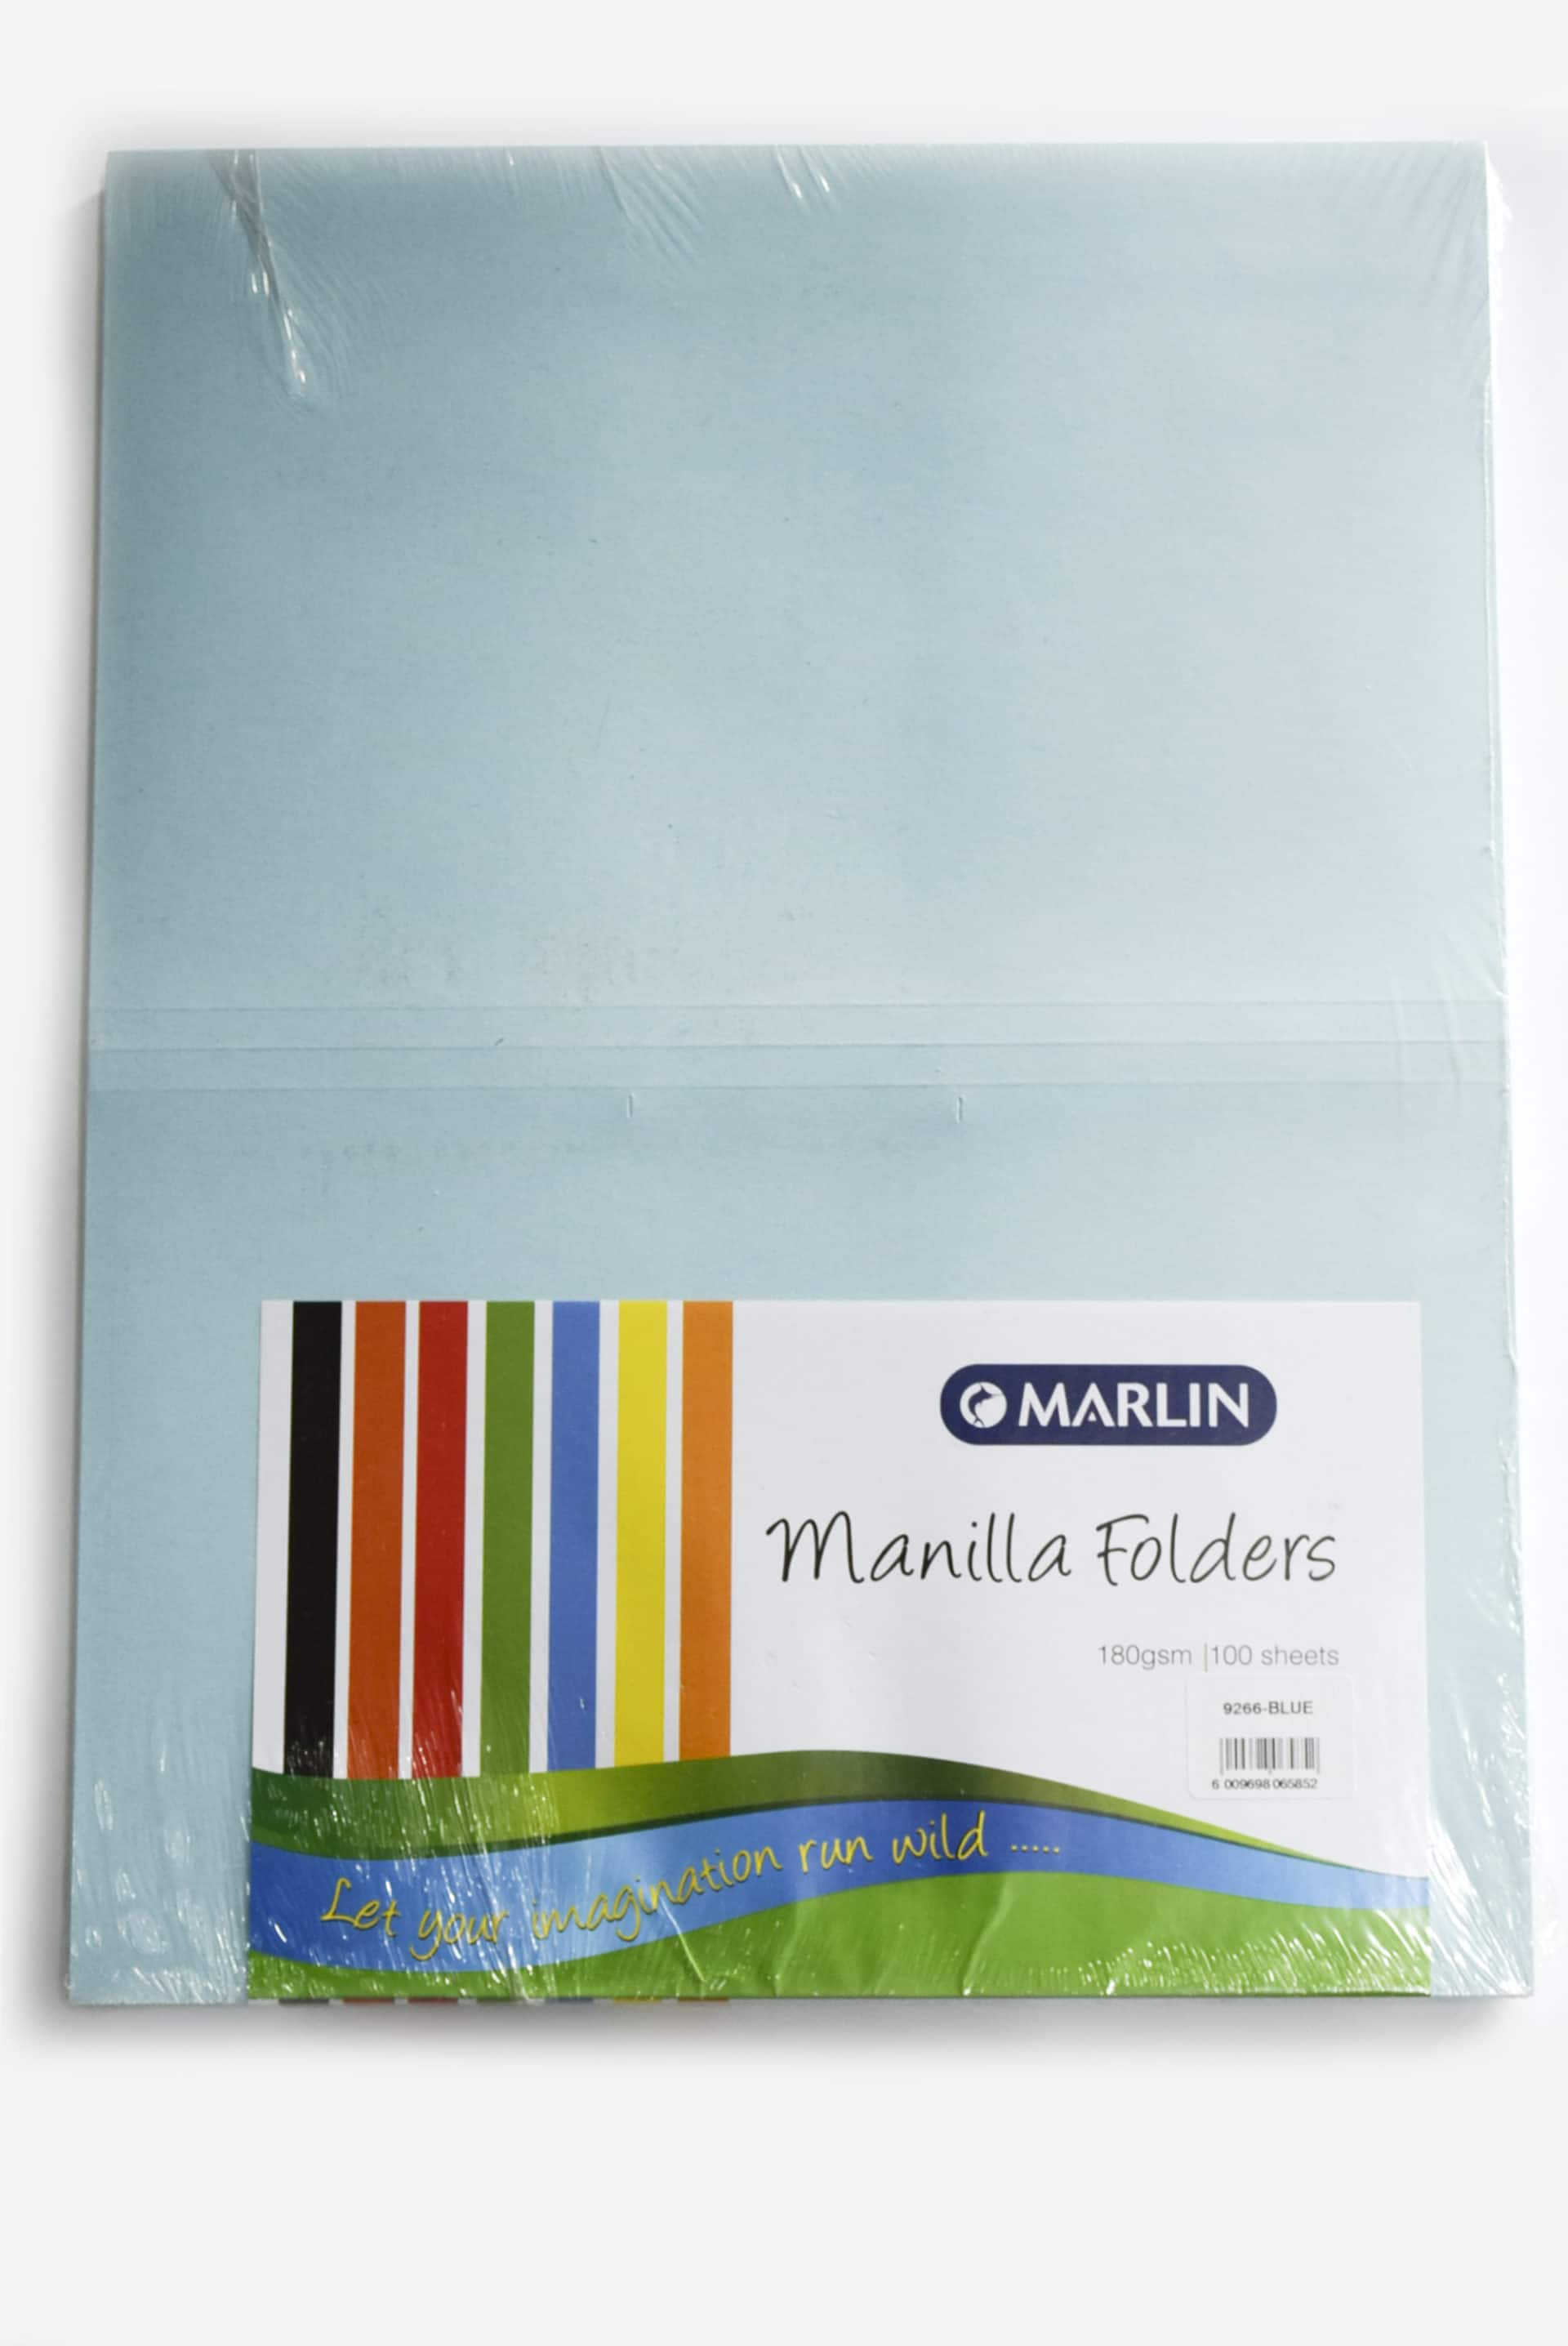 Manilla Folders 9266 Blue 100's 1